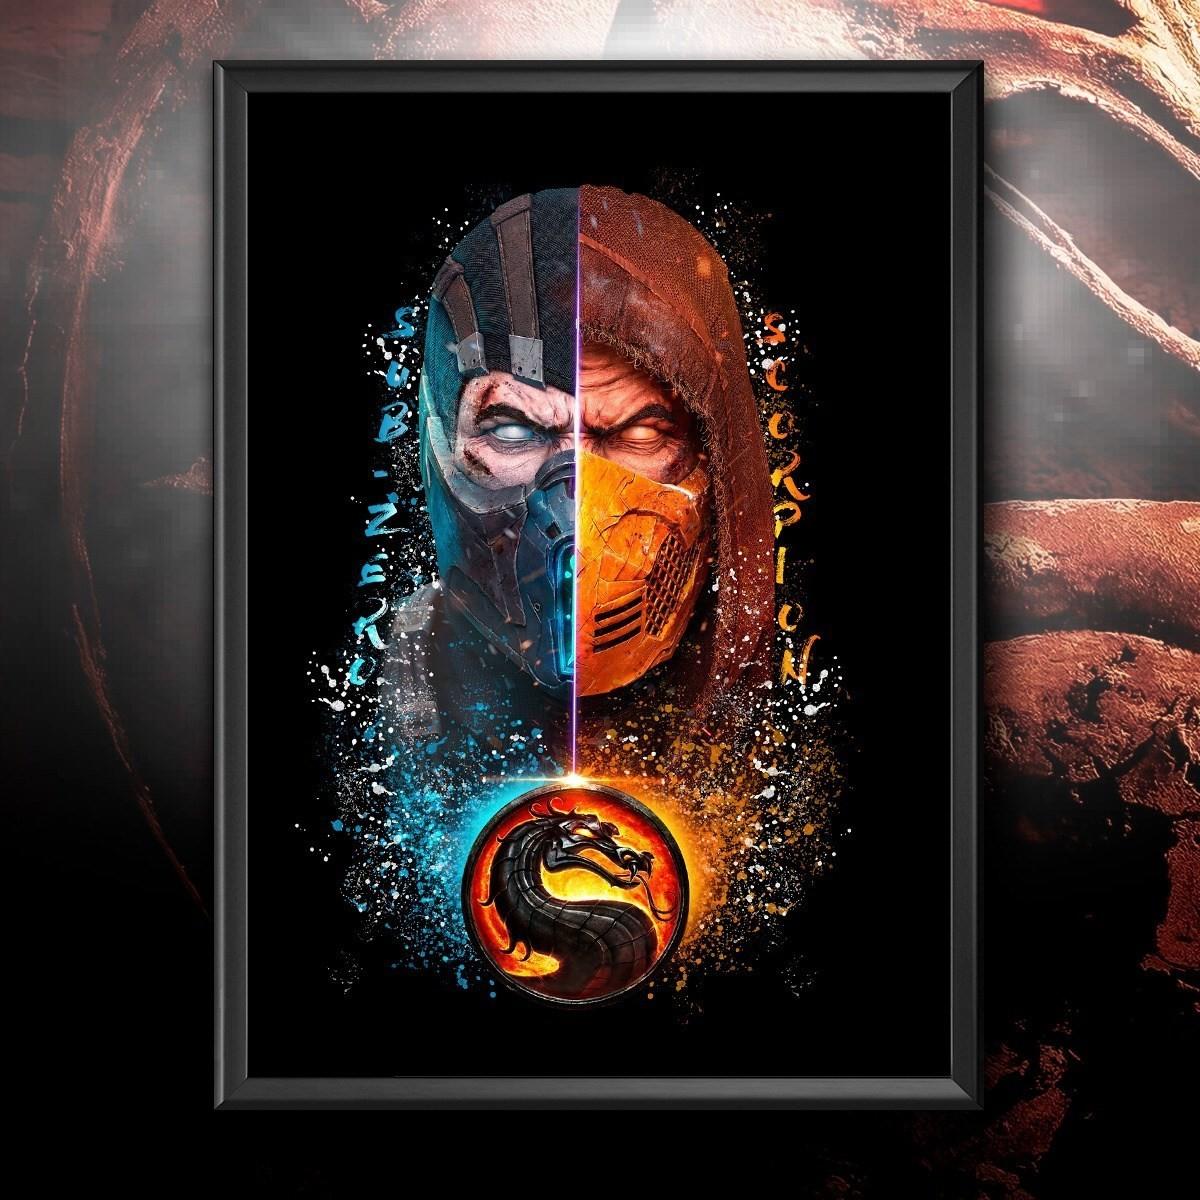 Quadro Subzero e Scorpion: Mortal Kombat 46x33cm